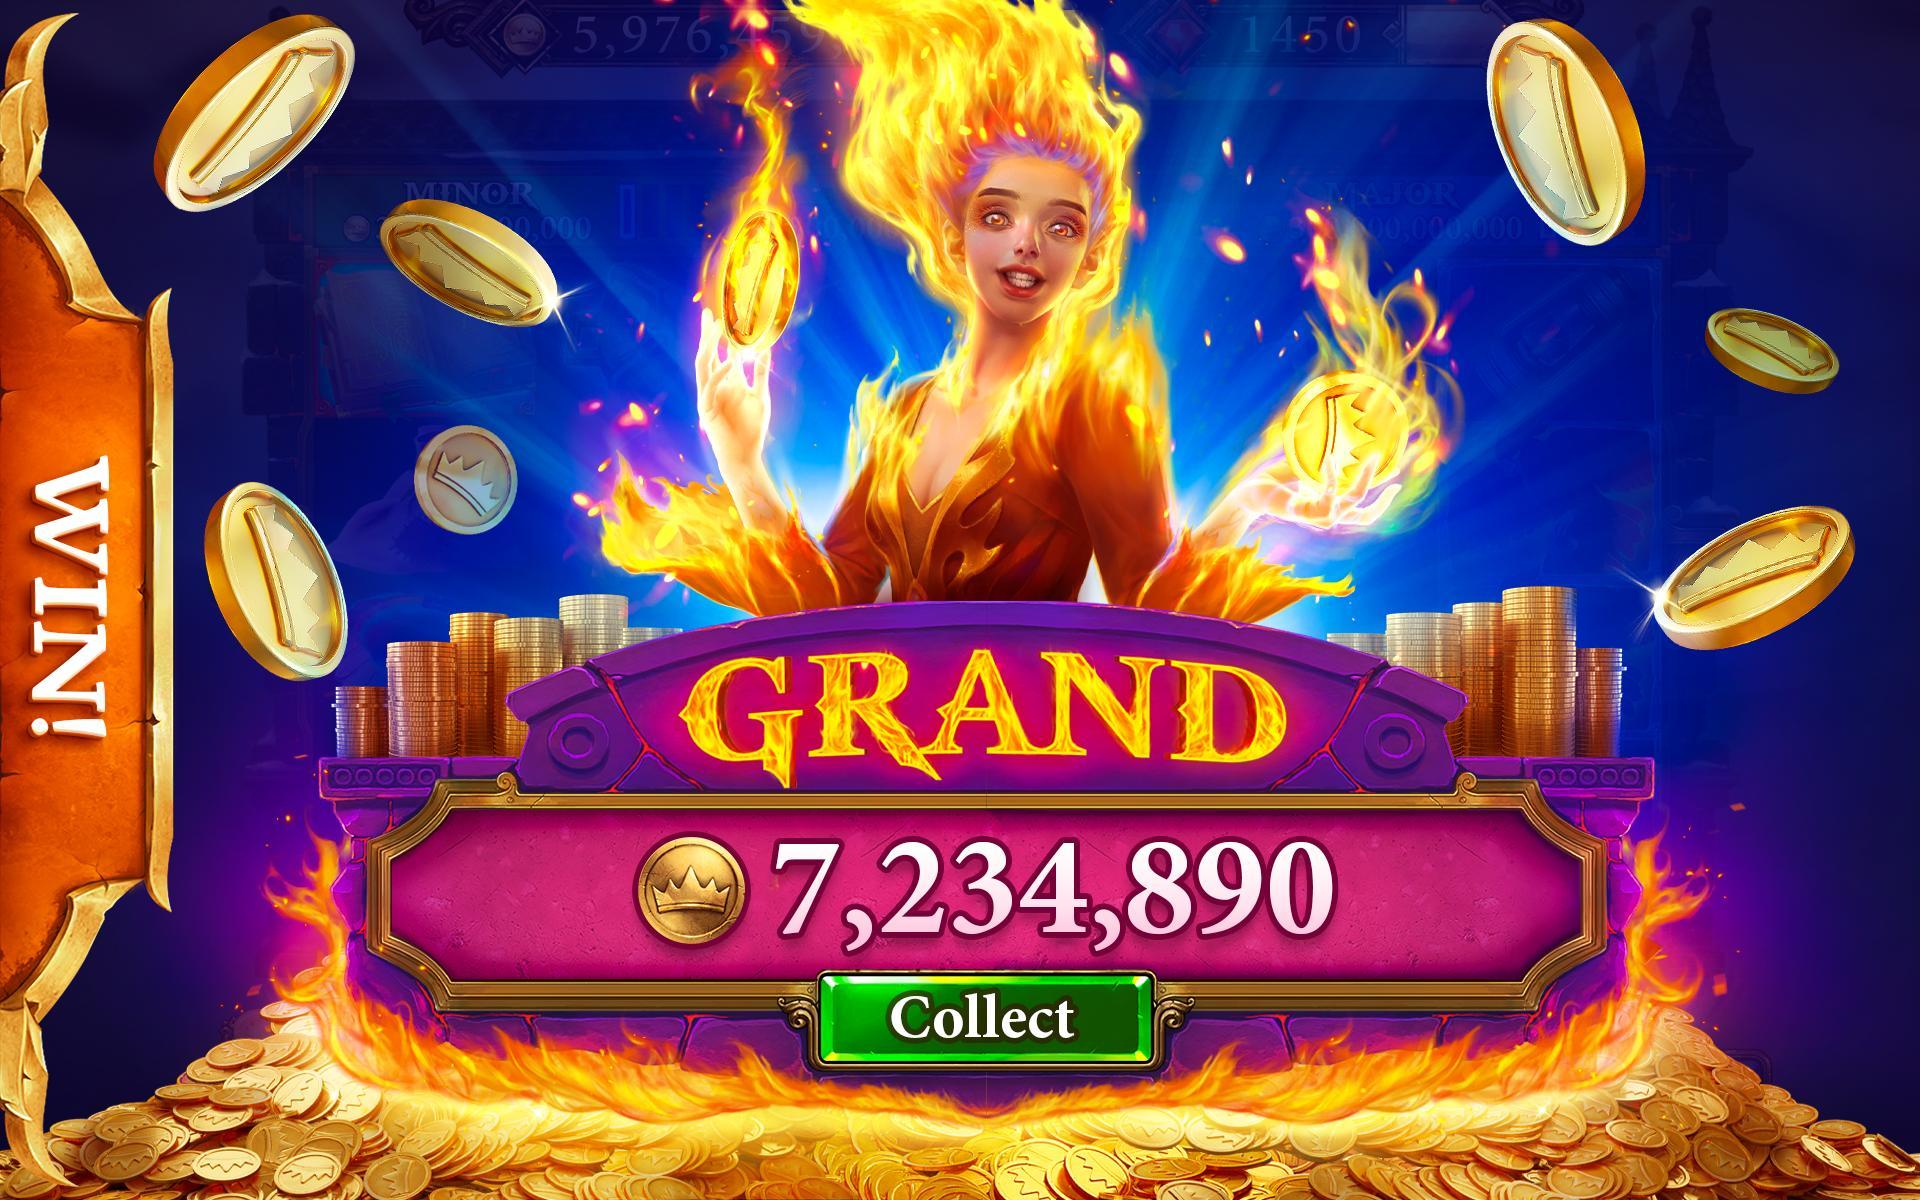 Scatter Slots Las Vegas Casino Game 777 Online 3.87.0 Screenshot 15